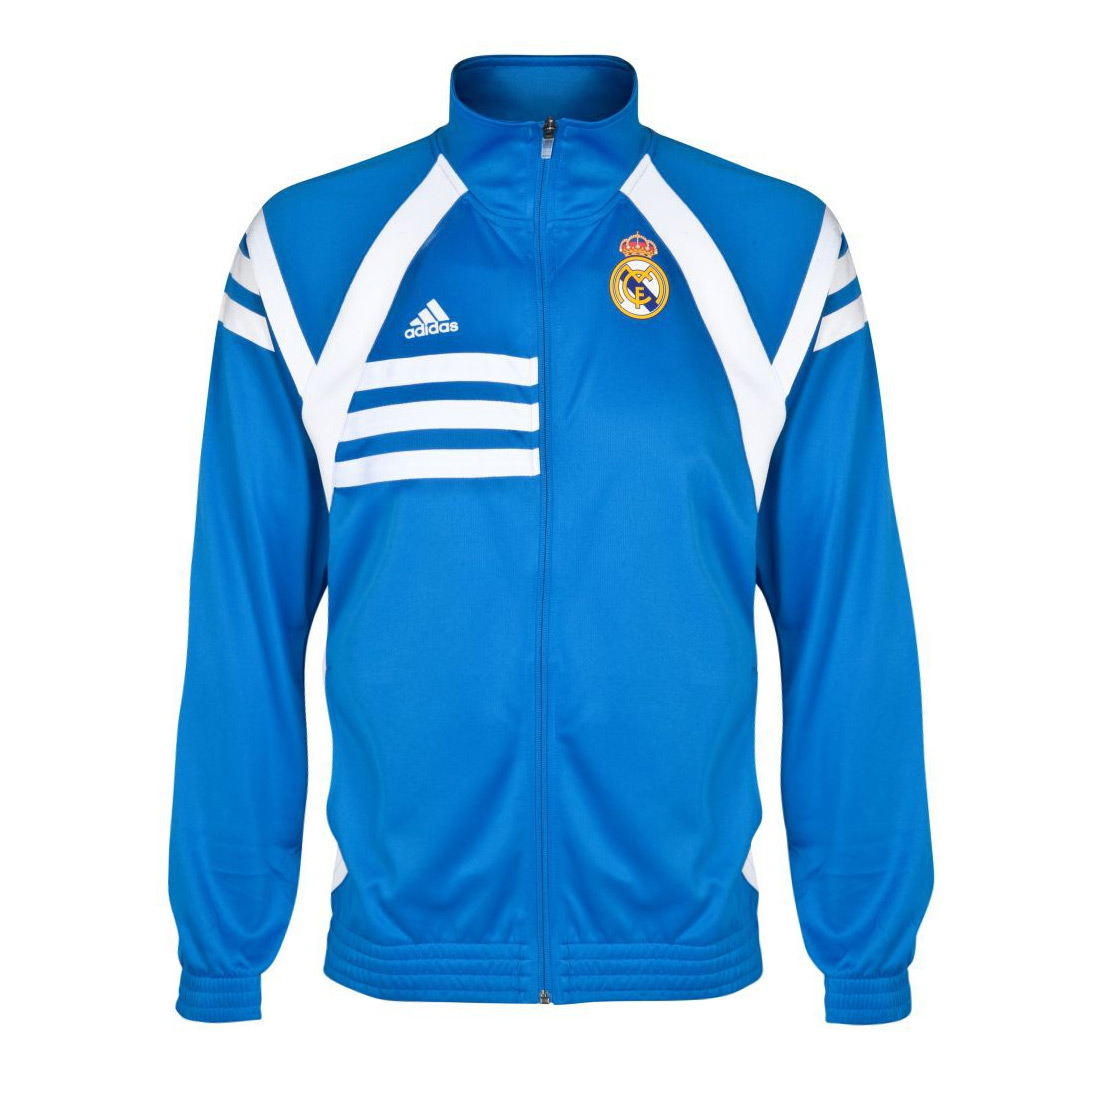 Adidas Men Regista 18 PES Training Suit Set Red Soccer